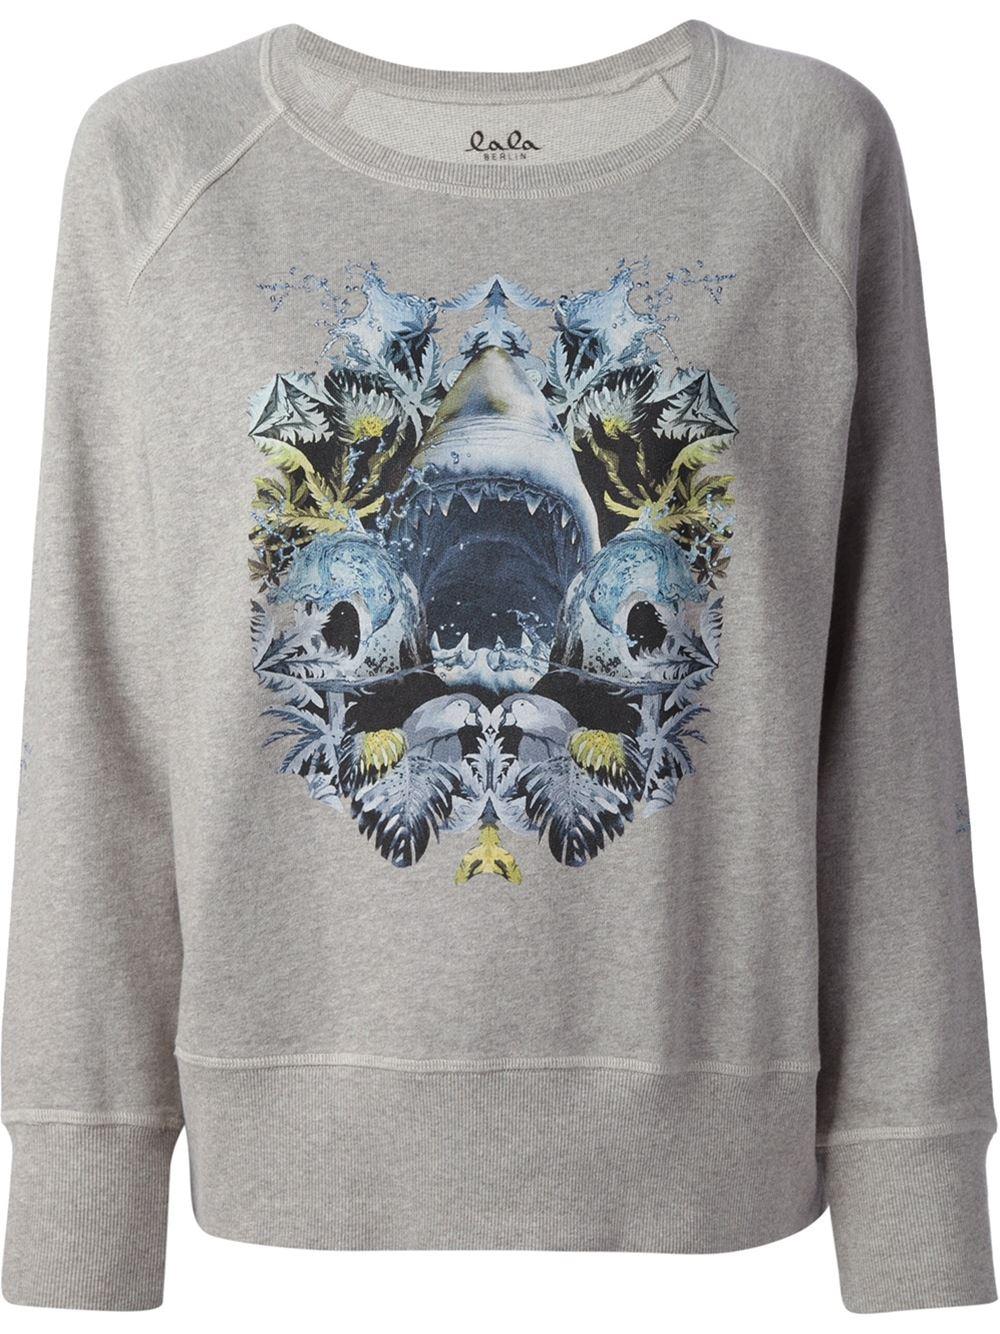 Lala Berlin Printed Shark Sweatshirt - Hayashi - Farfetch.com